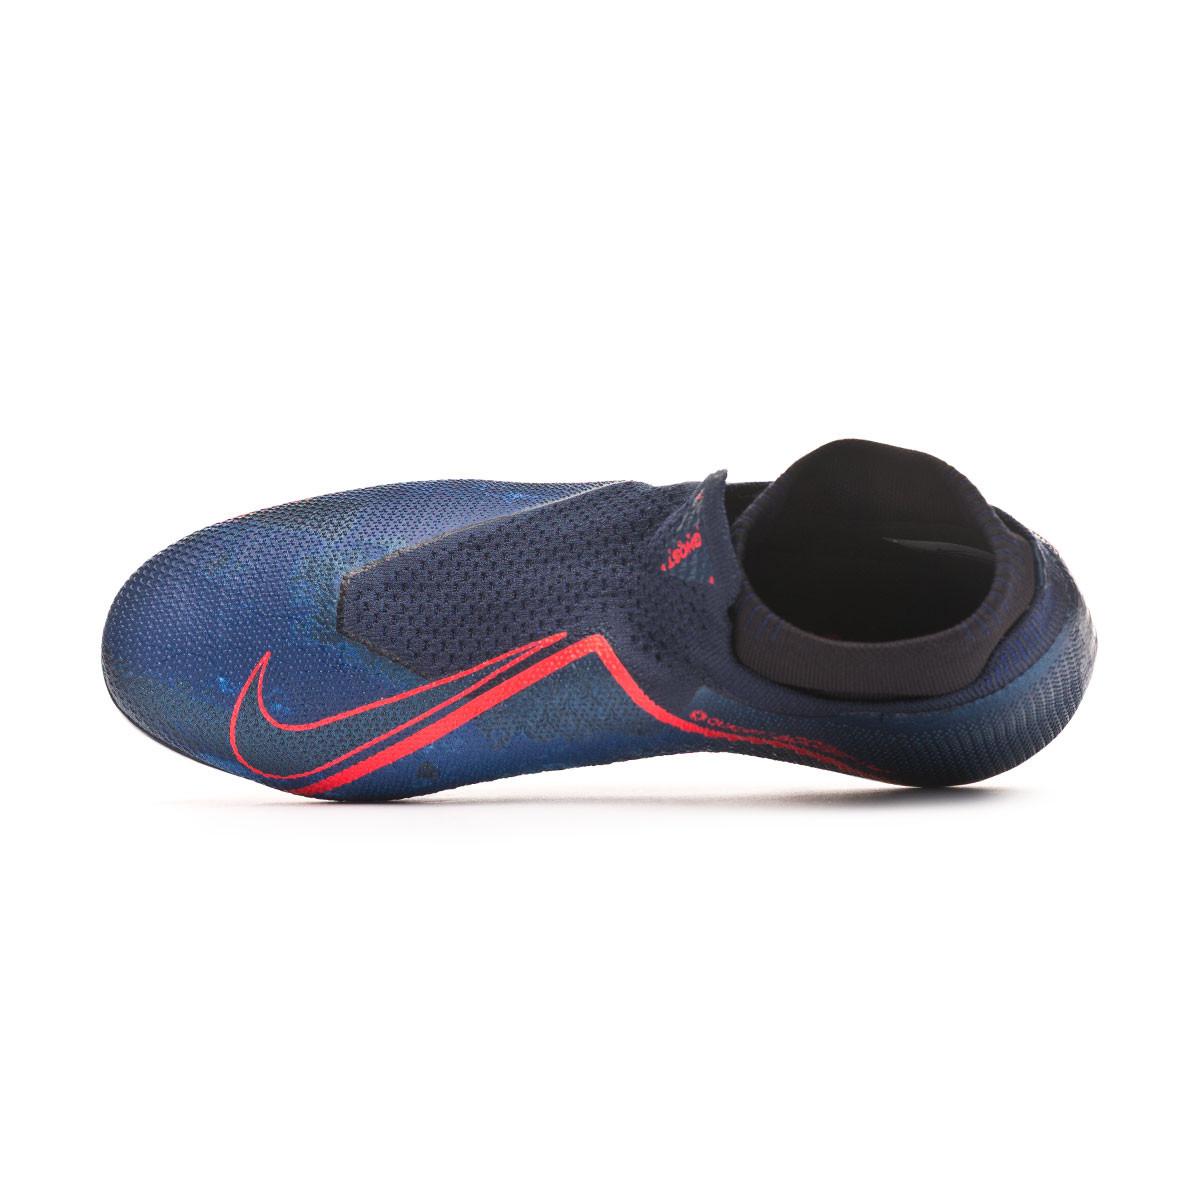 9c734a1b7 Football Boots Nike Phantom Vision Elite DF AG-Pro Obsidian-Black-Blue void  - Football store Fútbol Emotion